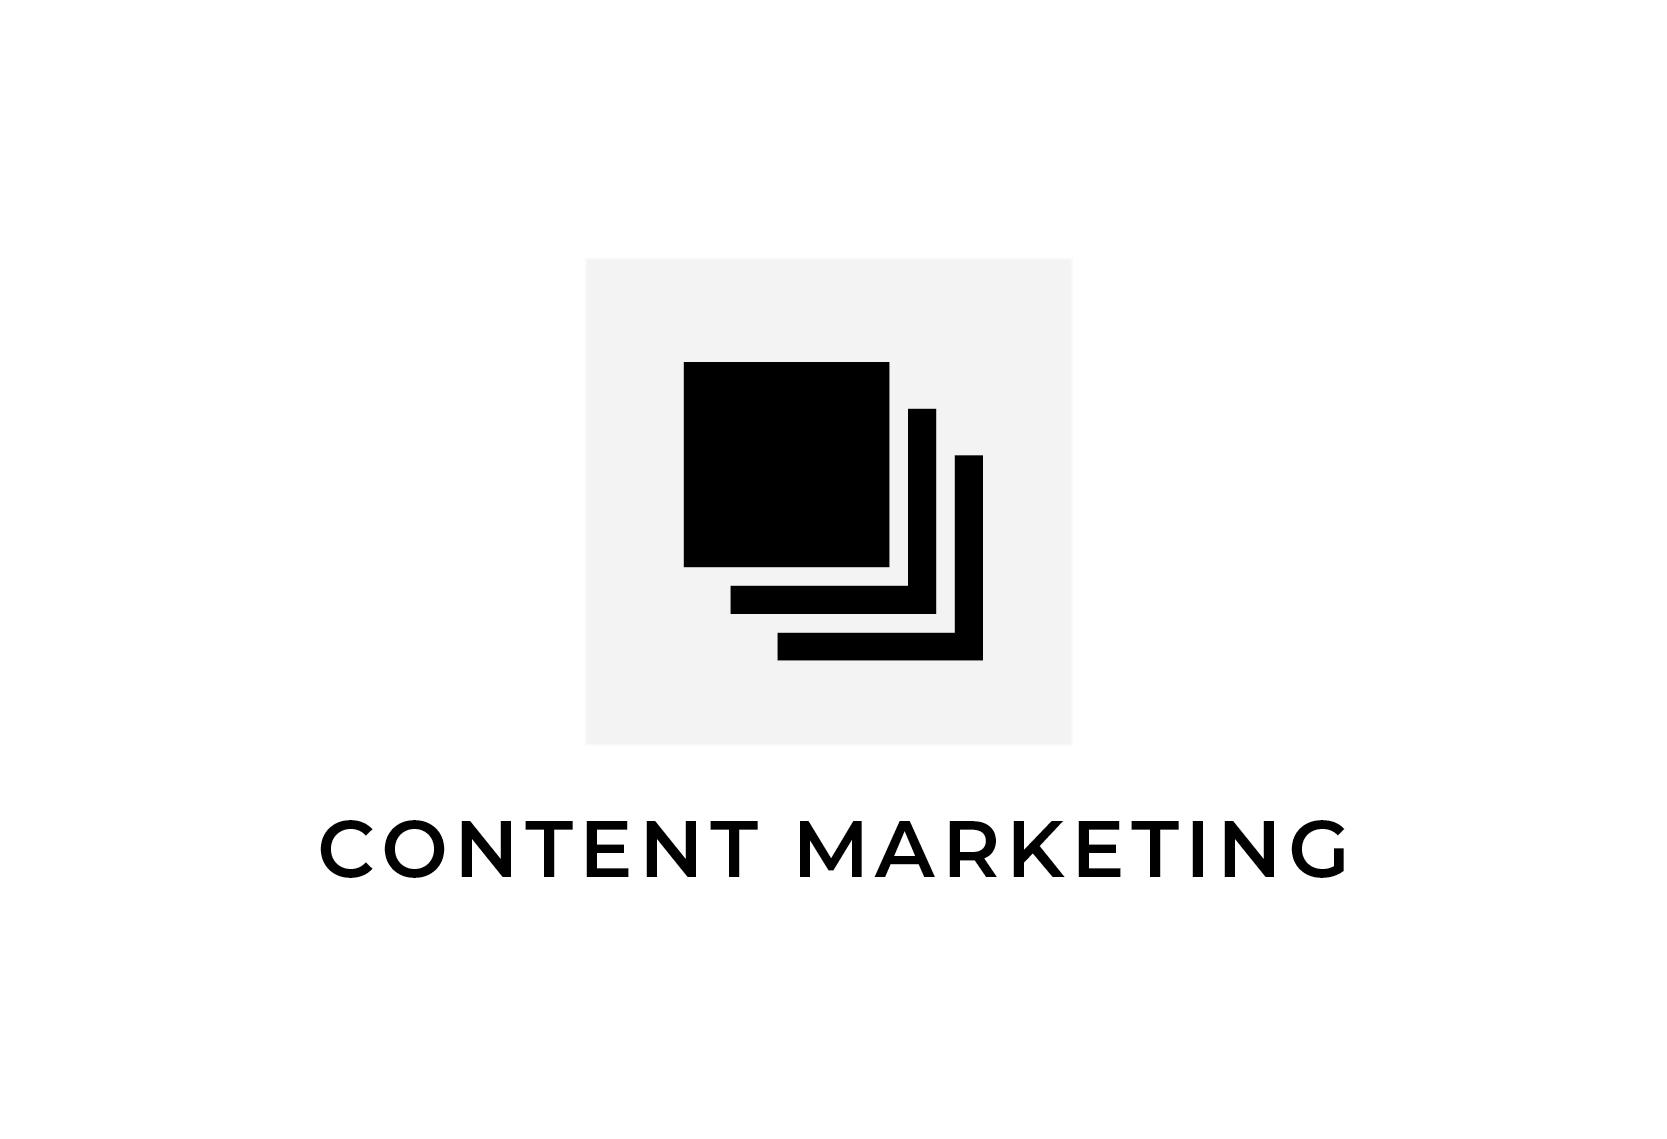 Contentmarketing.jpg